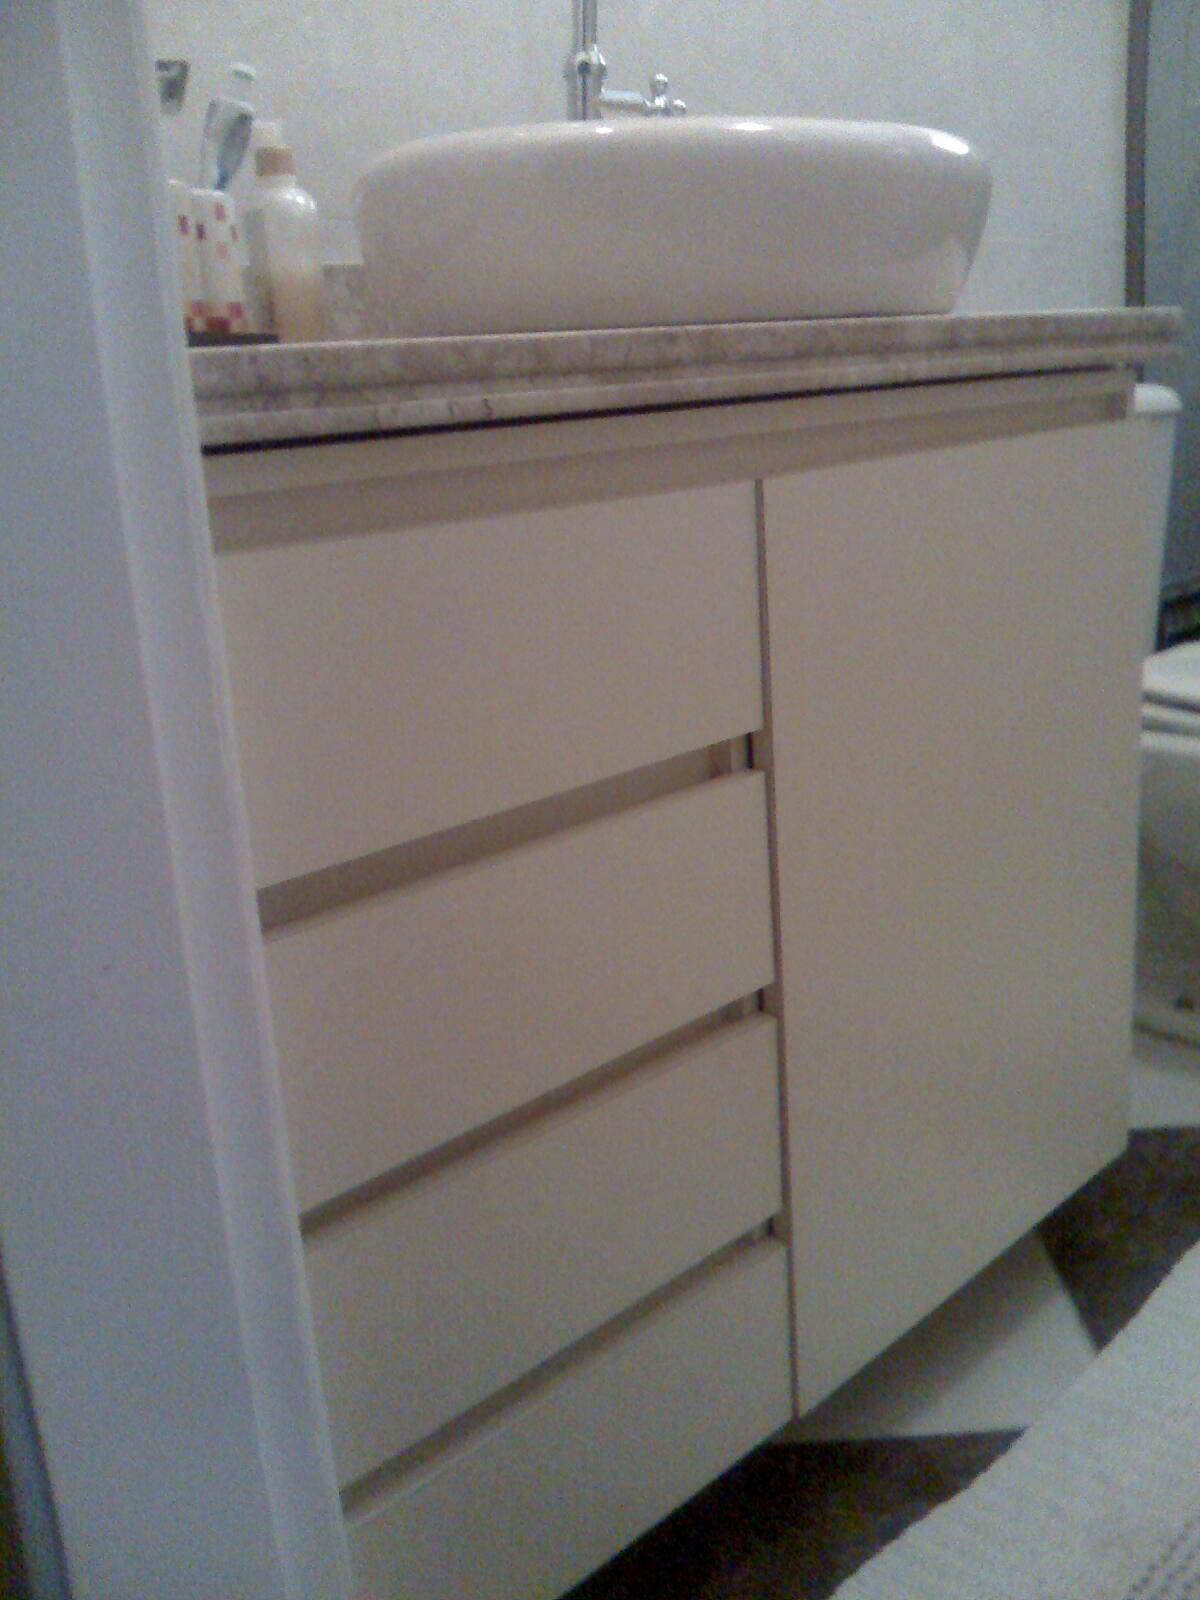 Castello Marcenaria Gabinete Banheiro -> Gabinete De Banheiro Bumi